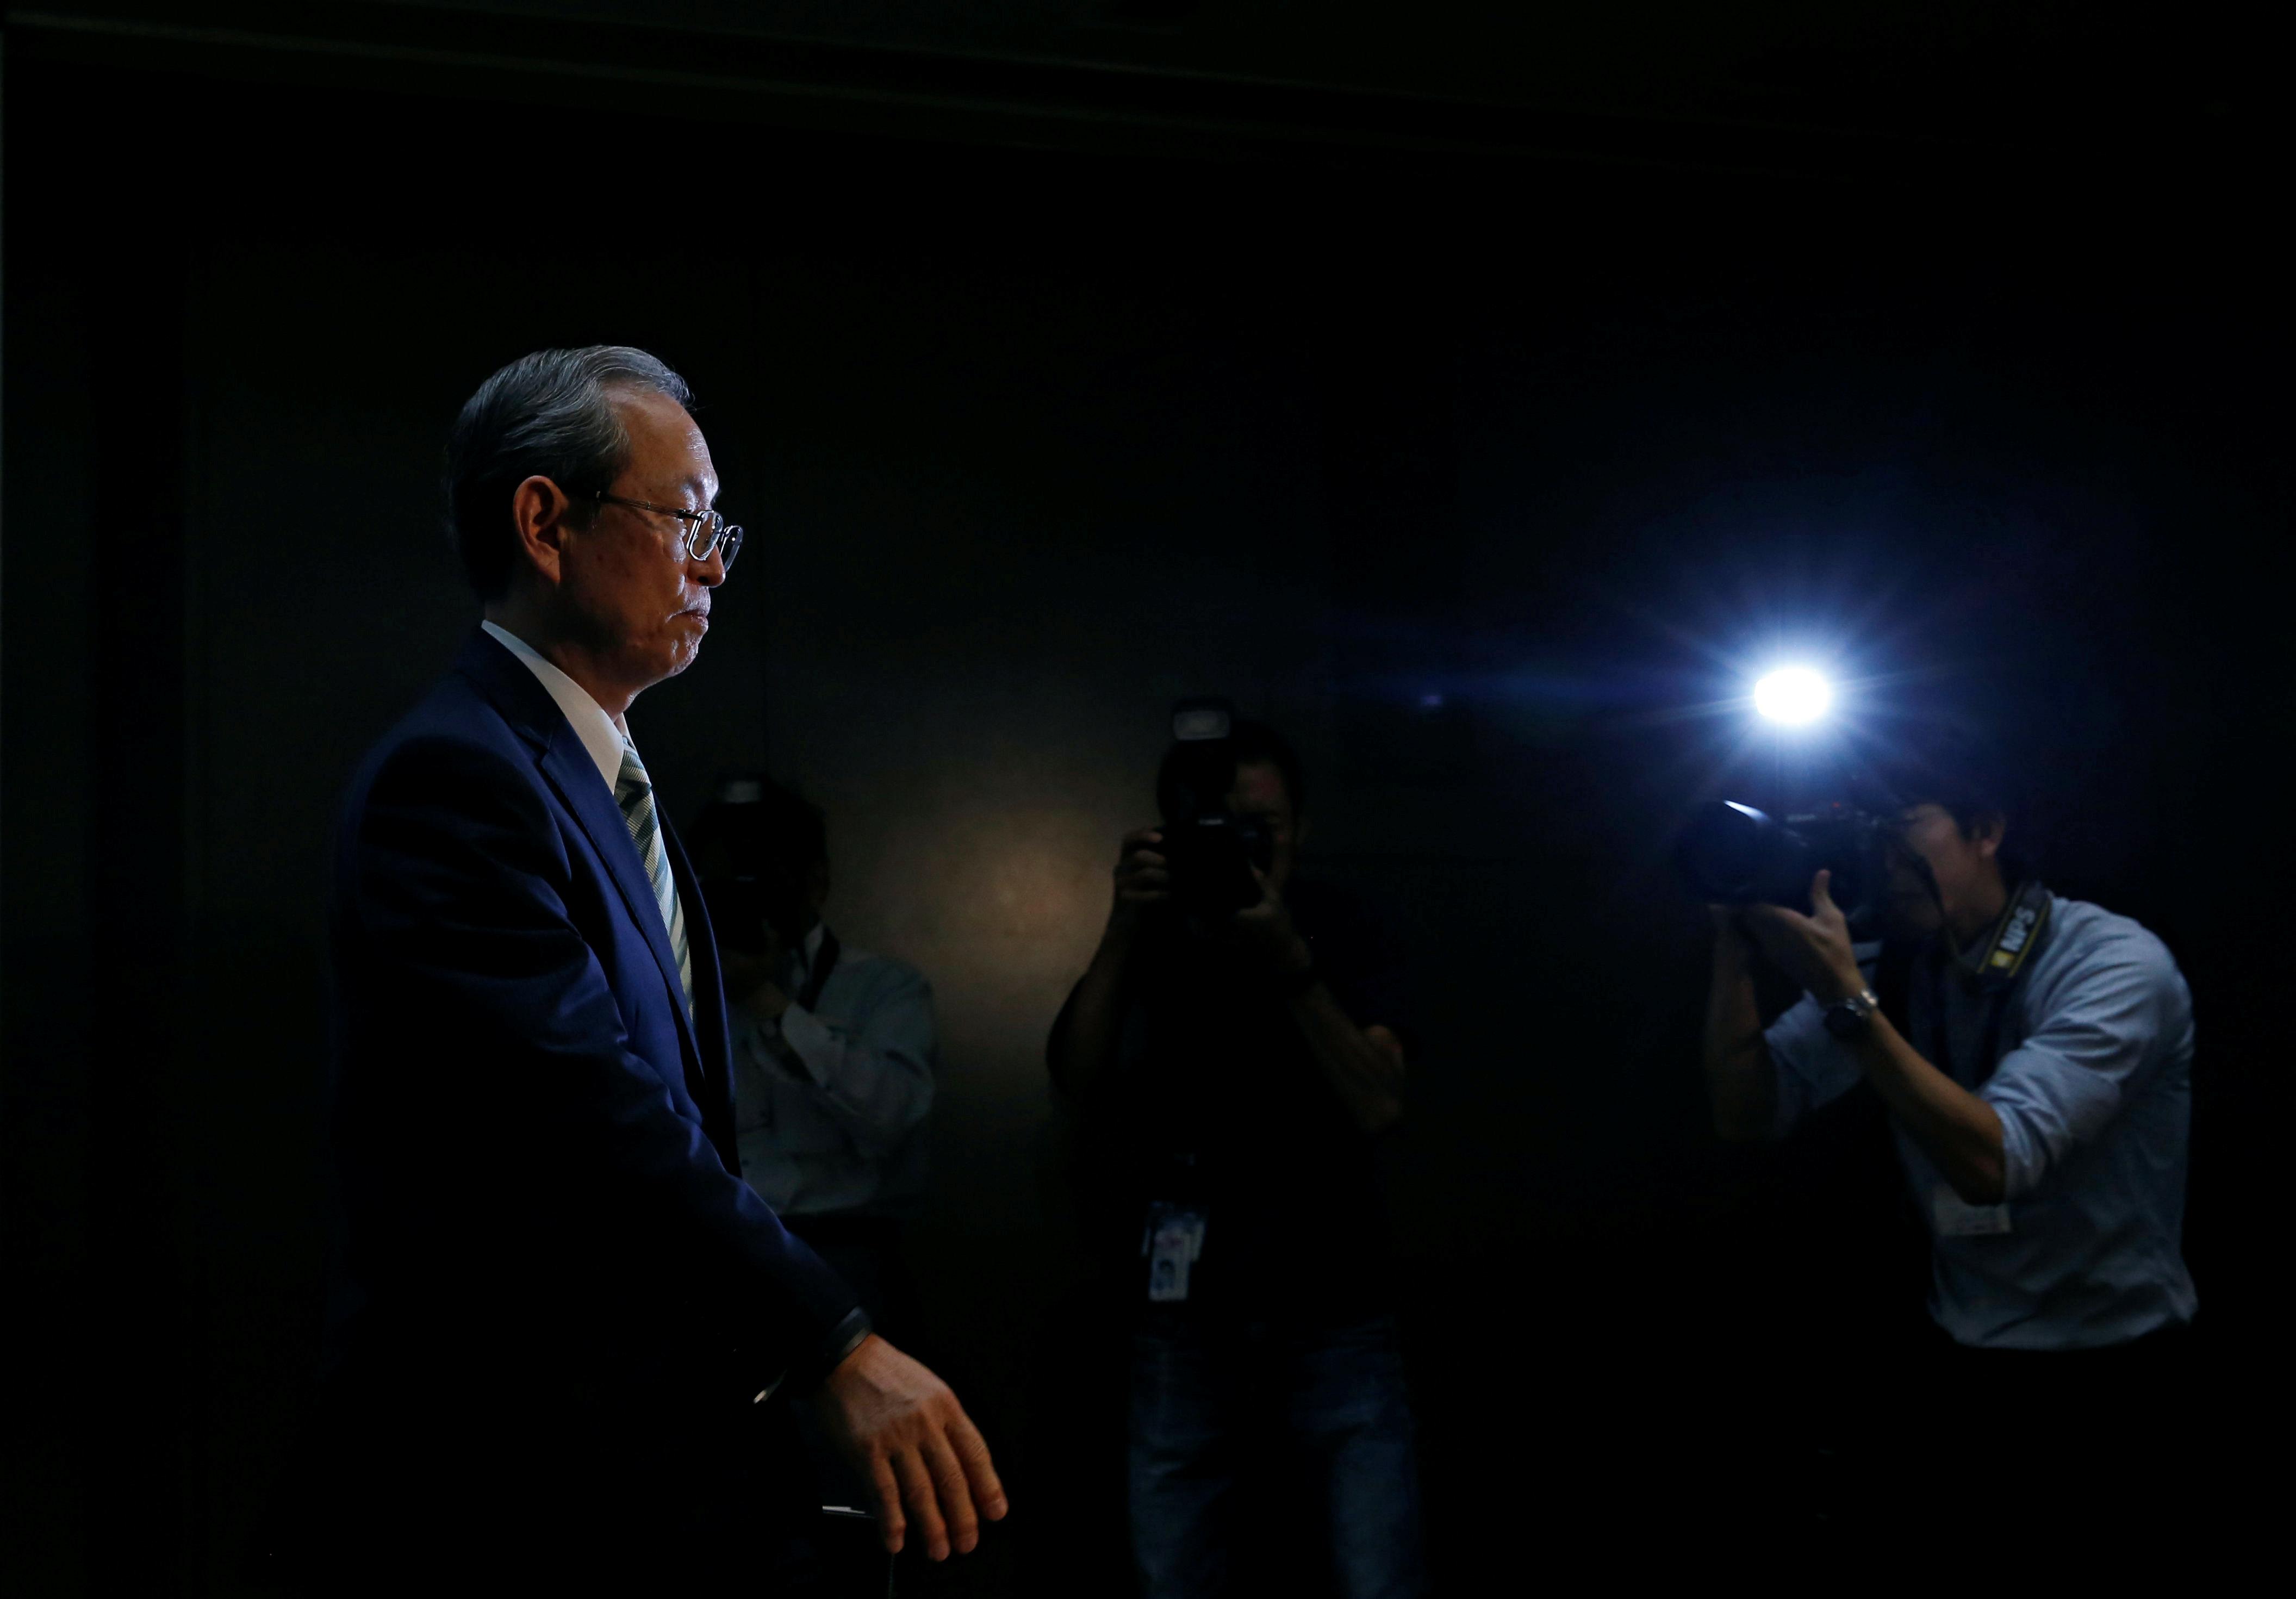 Toshiba Corp CEO Satoshi Tsunakawa leaves a news conference at the company's headquarters in Tokyo, Japan, August 10, 2017.    REUTERS/Toru Hanai